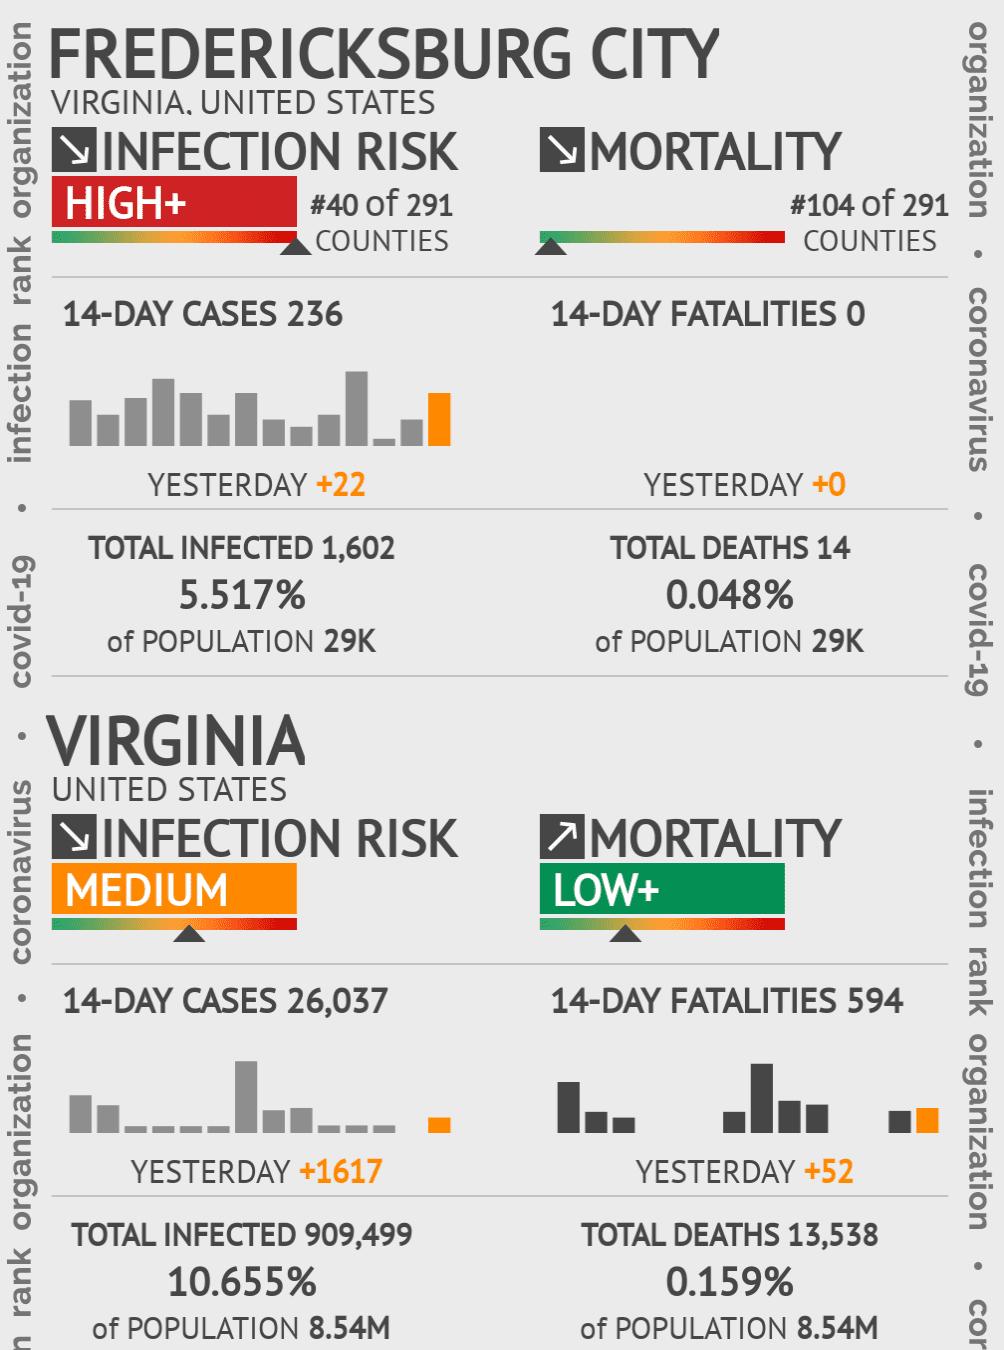 Fredericksburg City Coronavirus Covid-19 Risk of Infection on February 04, 2021